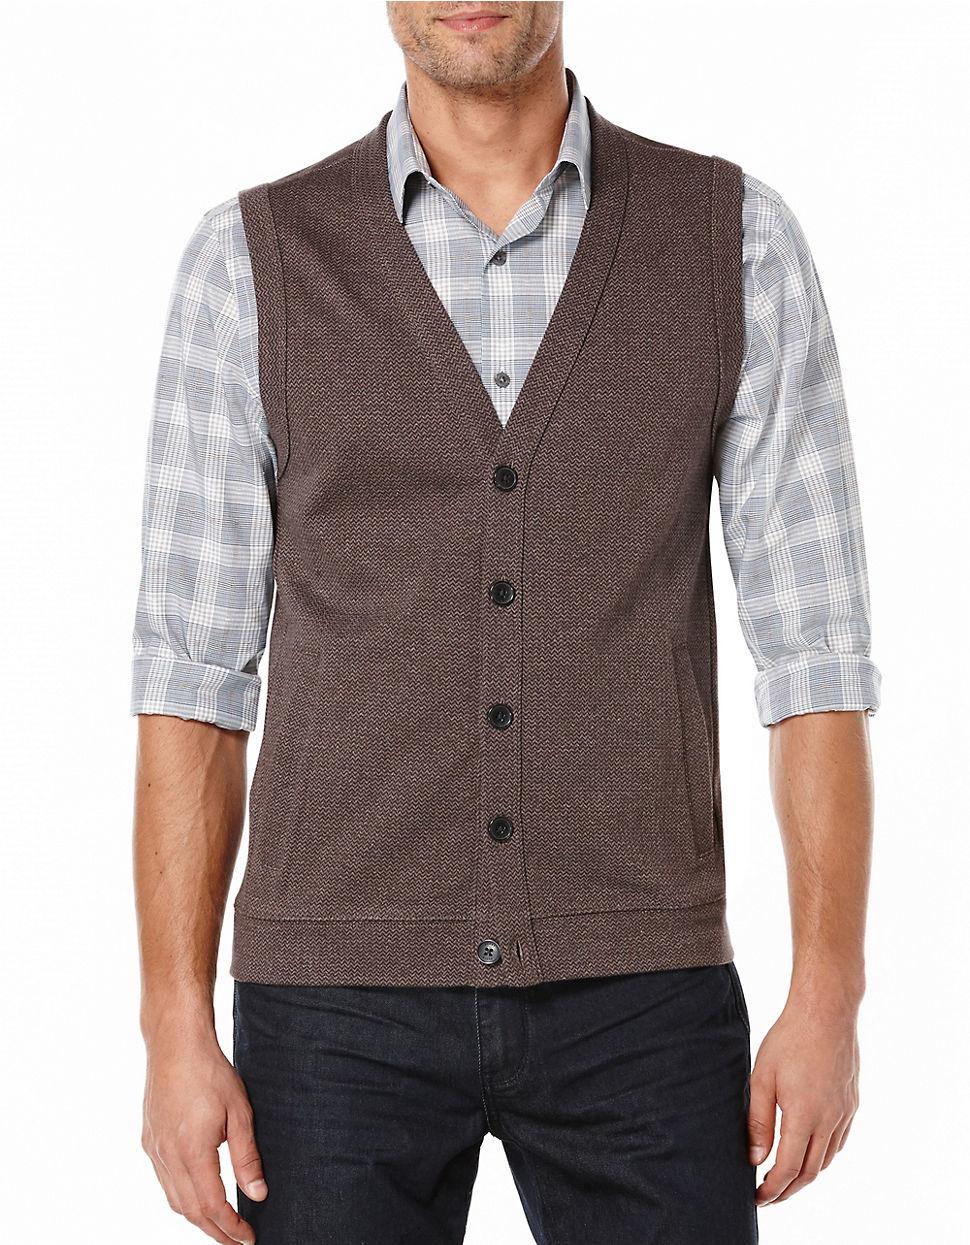 Perry ellis Big And Tall Herringbone Sweater Vest in Brown for Men ...